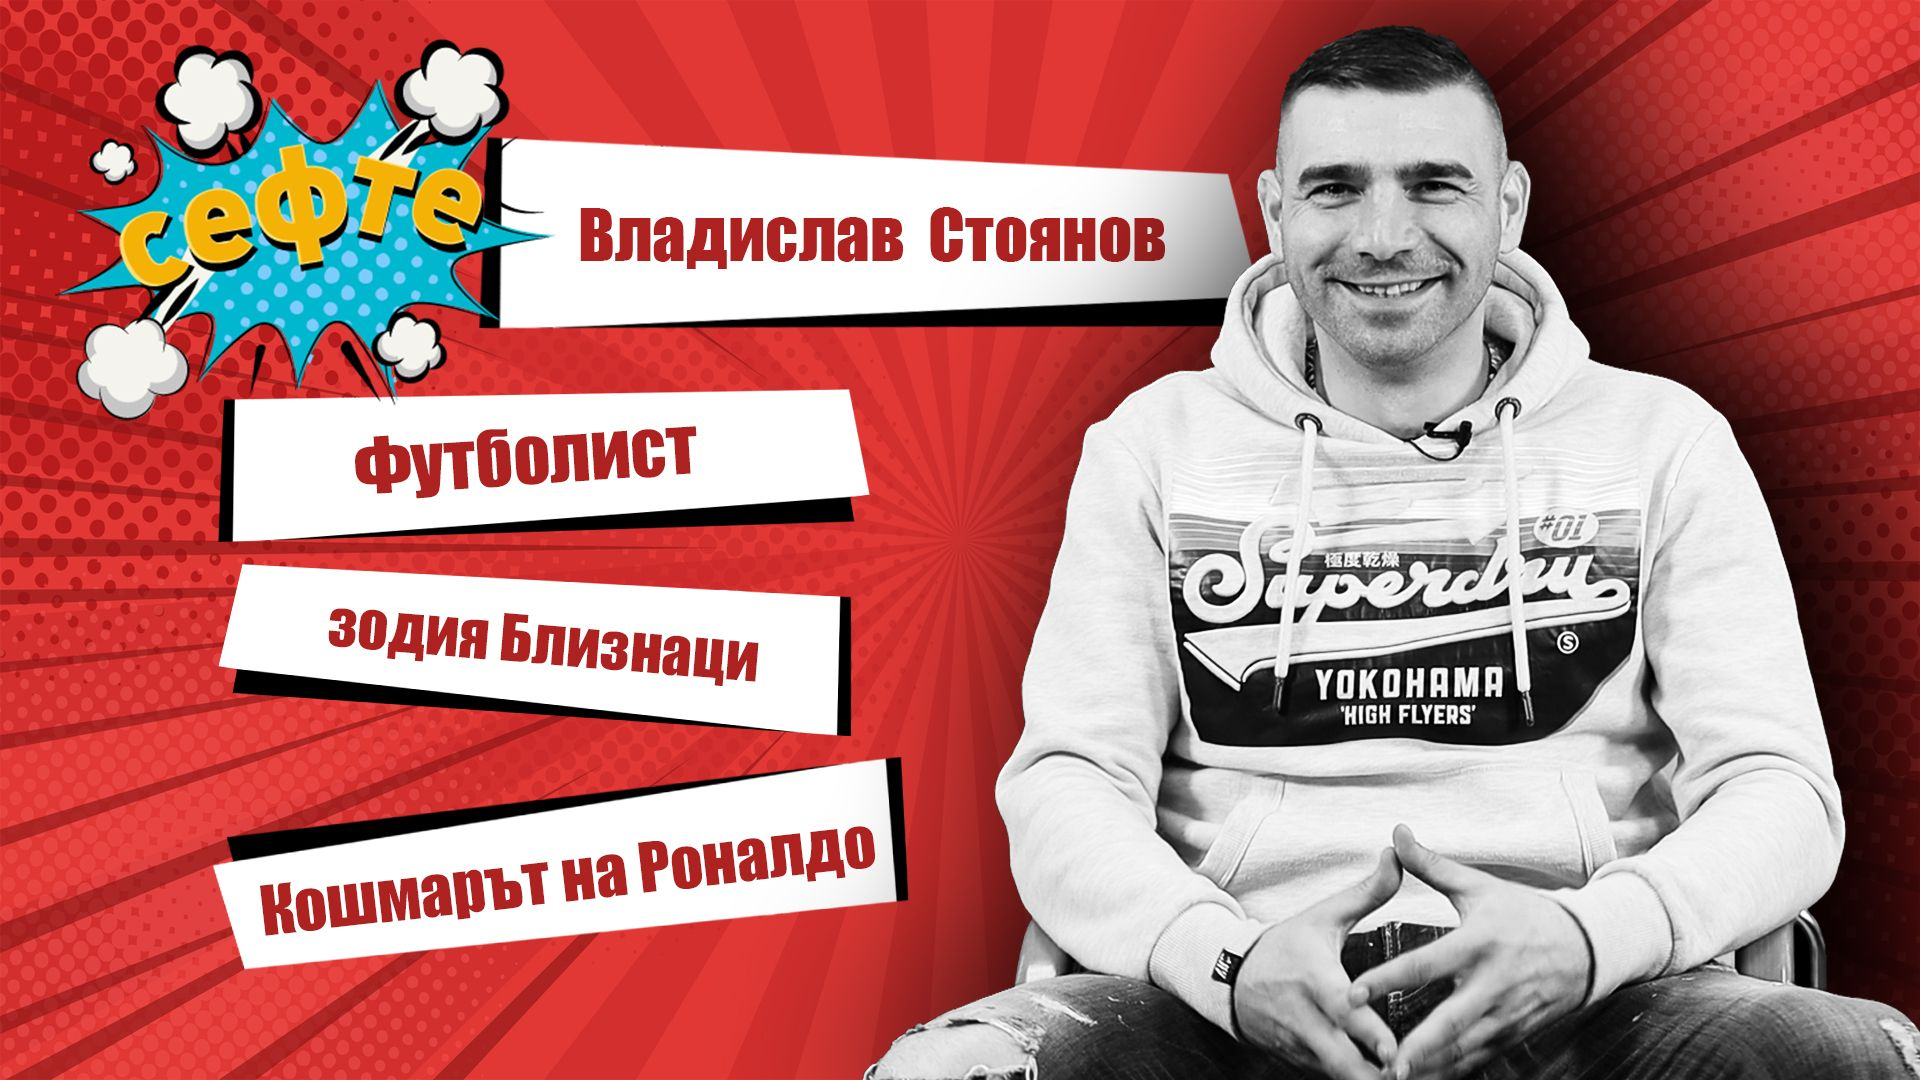 От запаления китеник до мачове с Шевченко и Роналдо: Владислав Стоянов в #Сефте